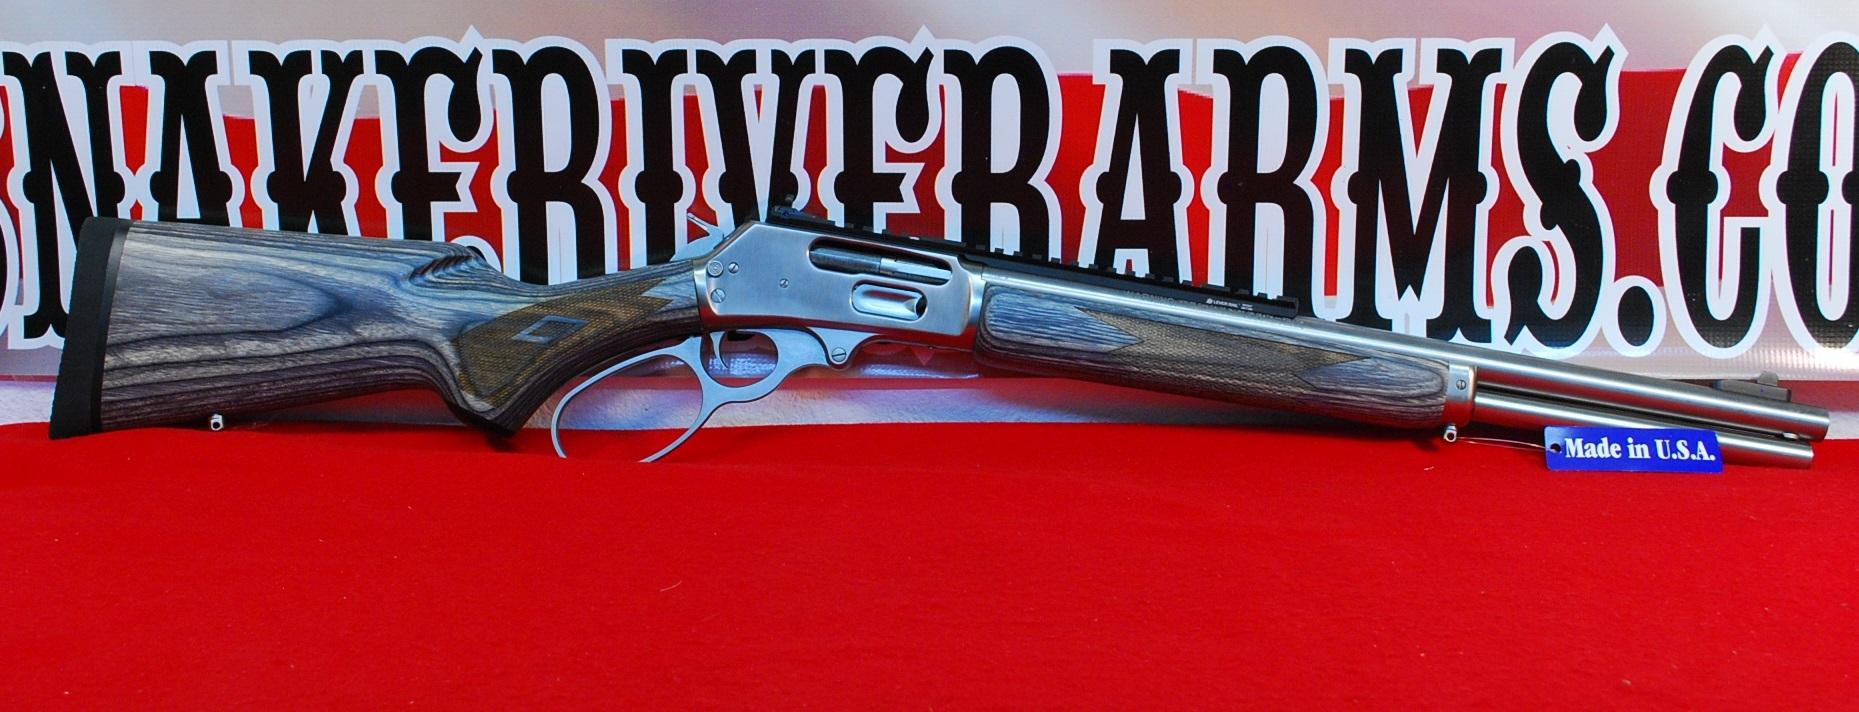 Marlin 1895-SBL 45-70 GOVT Rifle